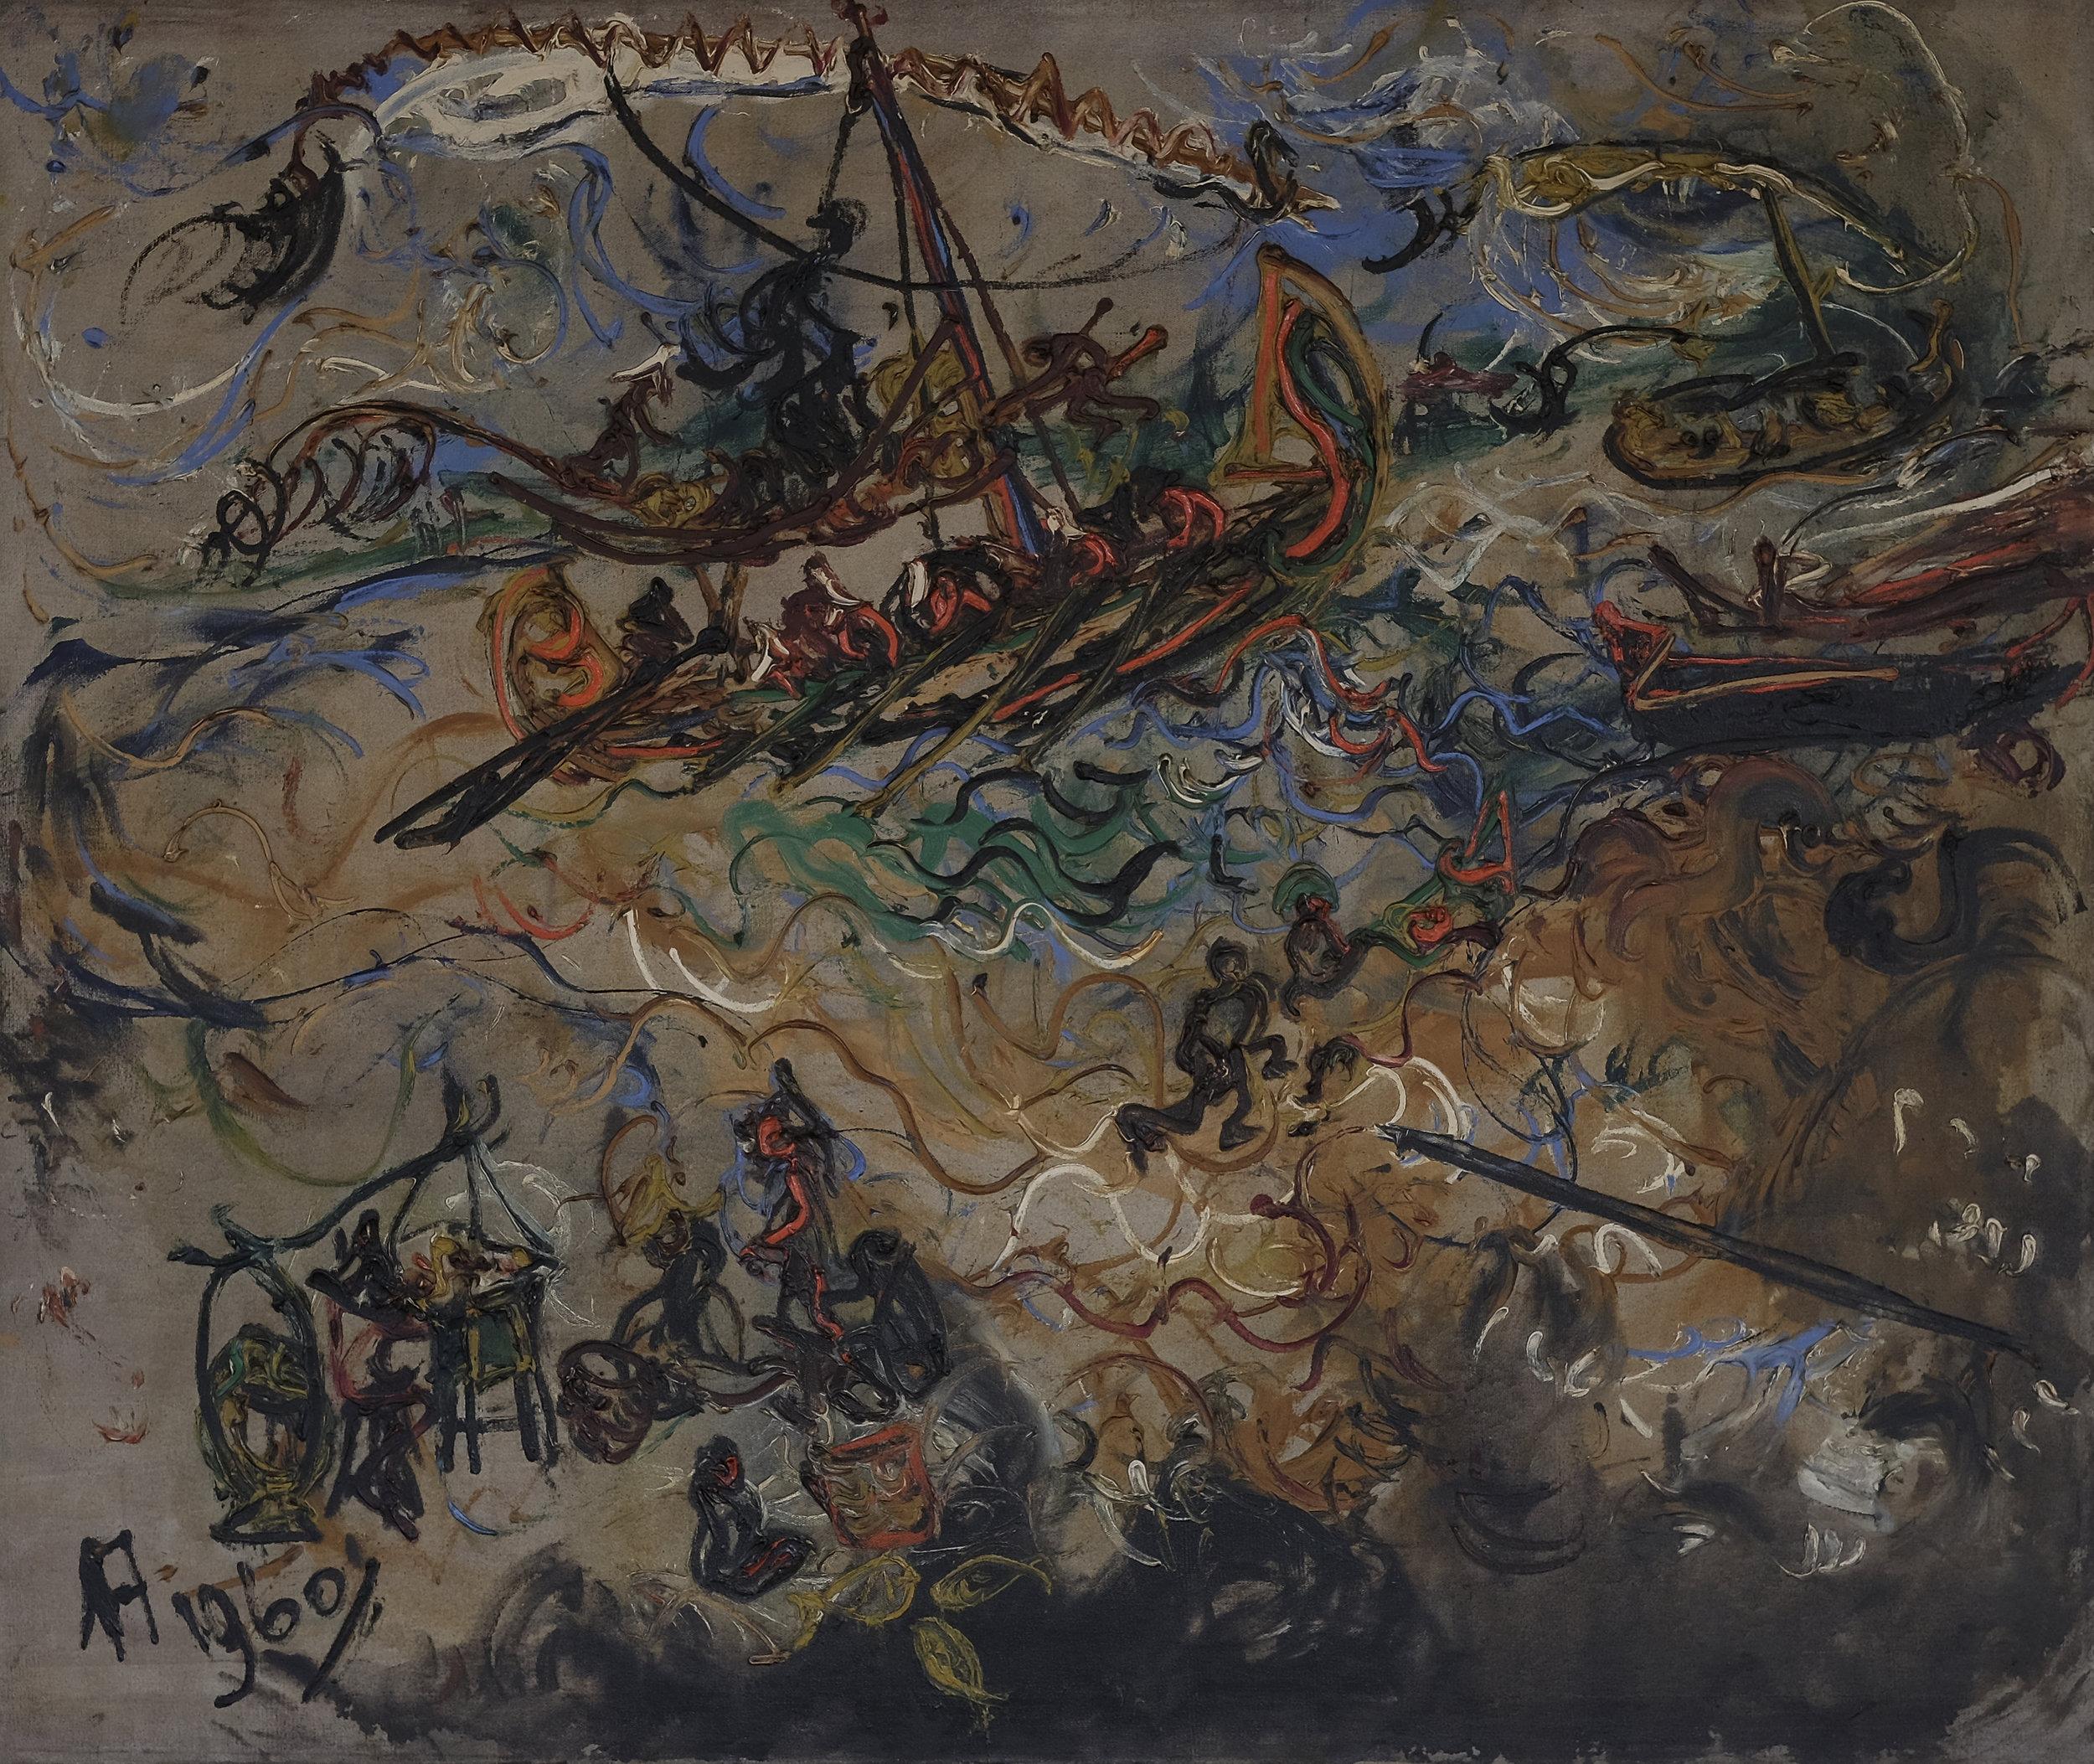 Affandi, Pemandangan Laut Jawa (Seascape of the Java Sea), ooc, 104 x 124 cm, 1960.jpeg